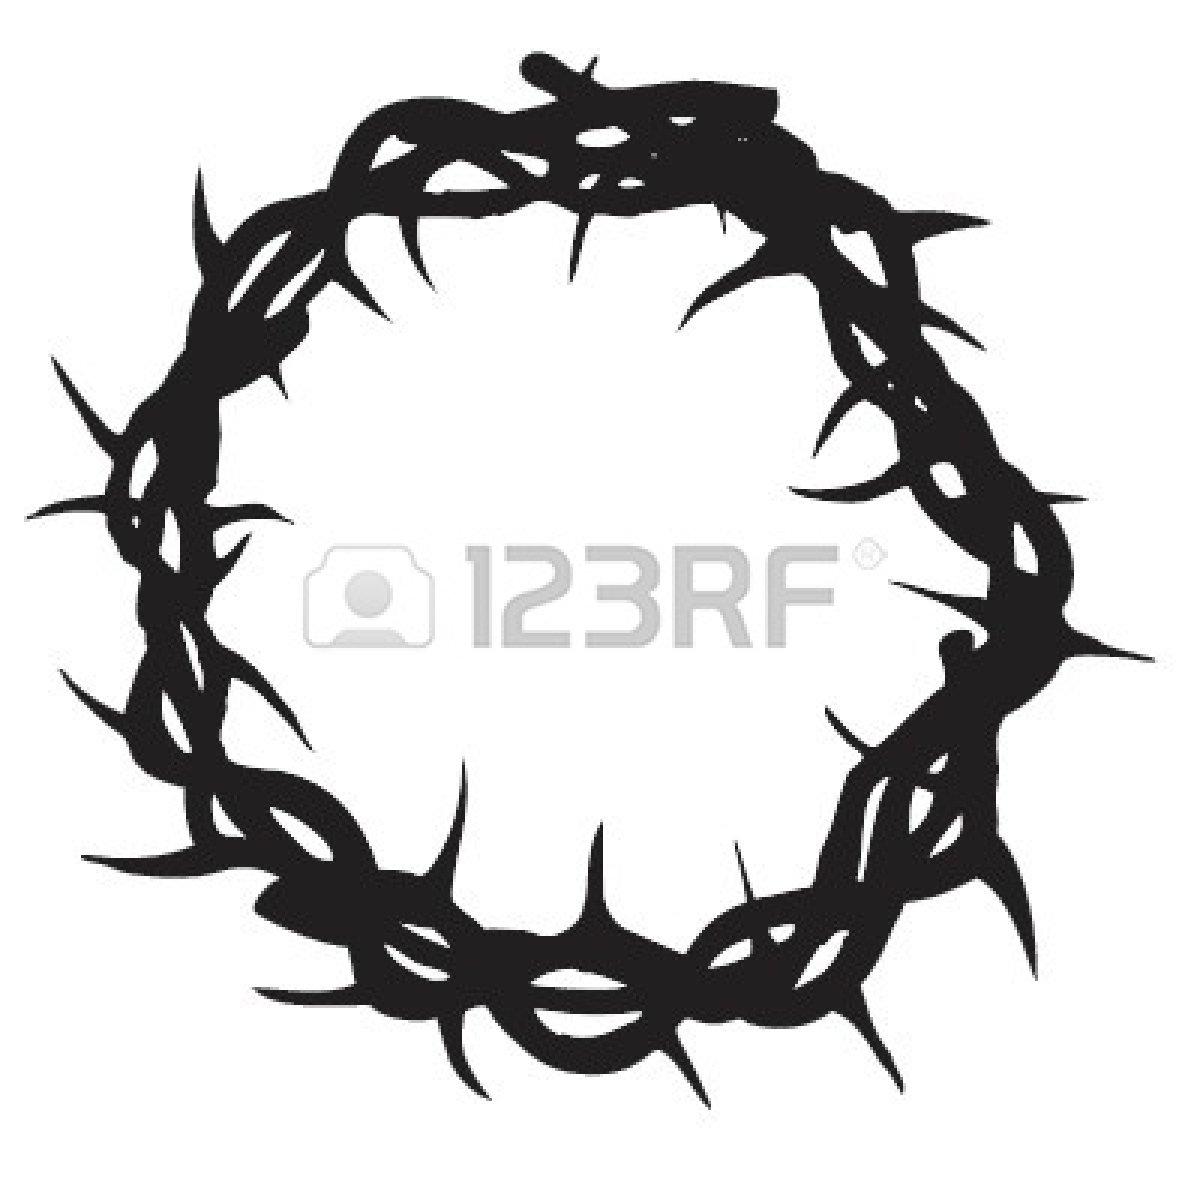 Wreath Of Thorns Clipart